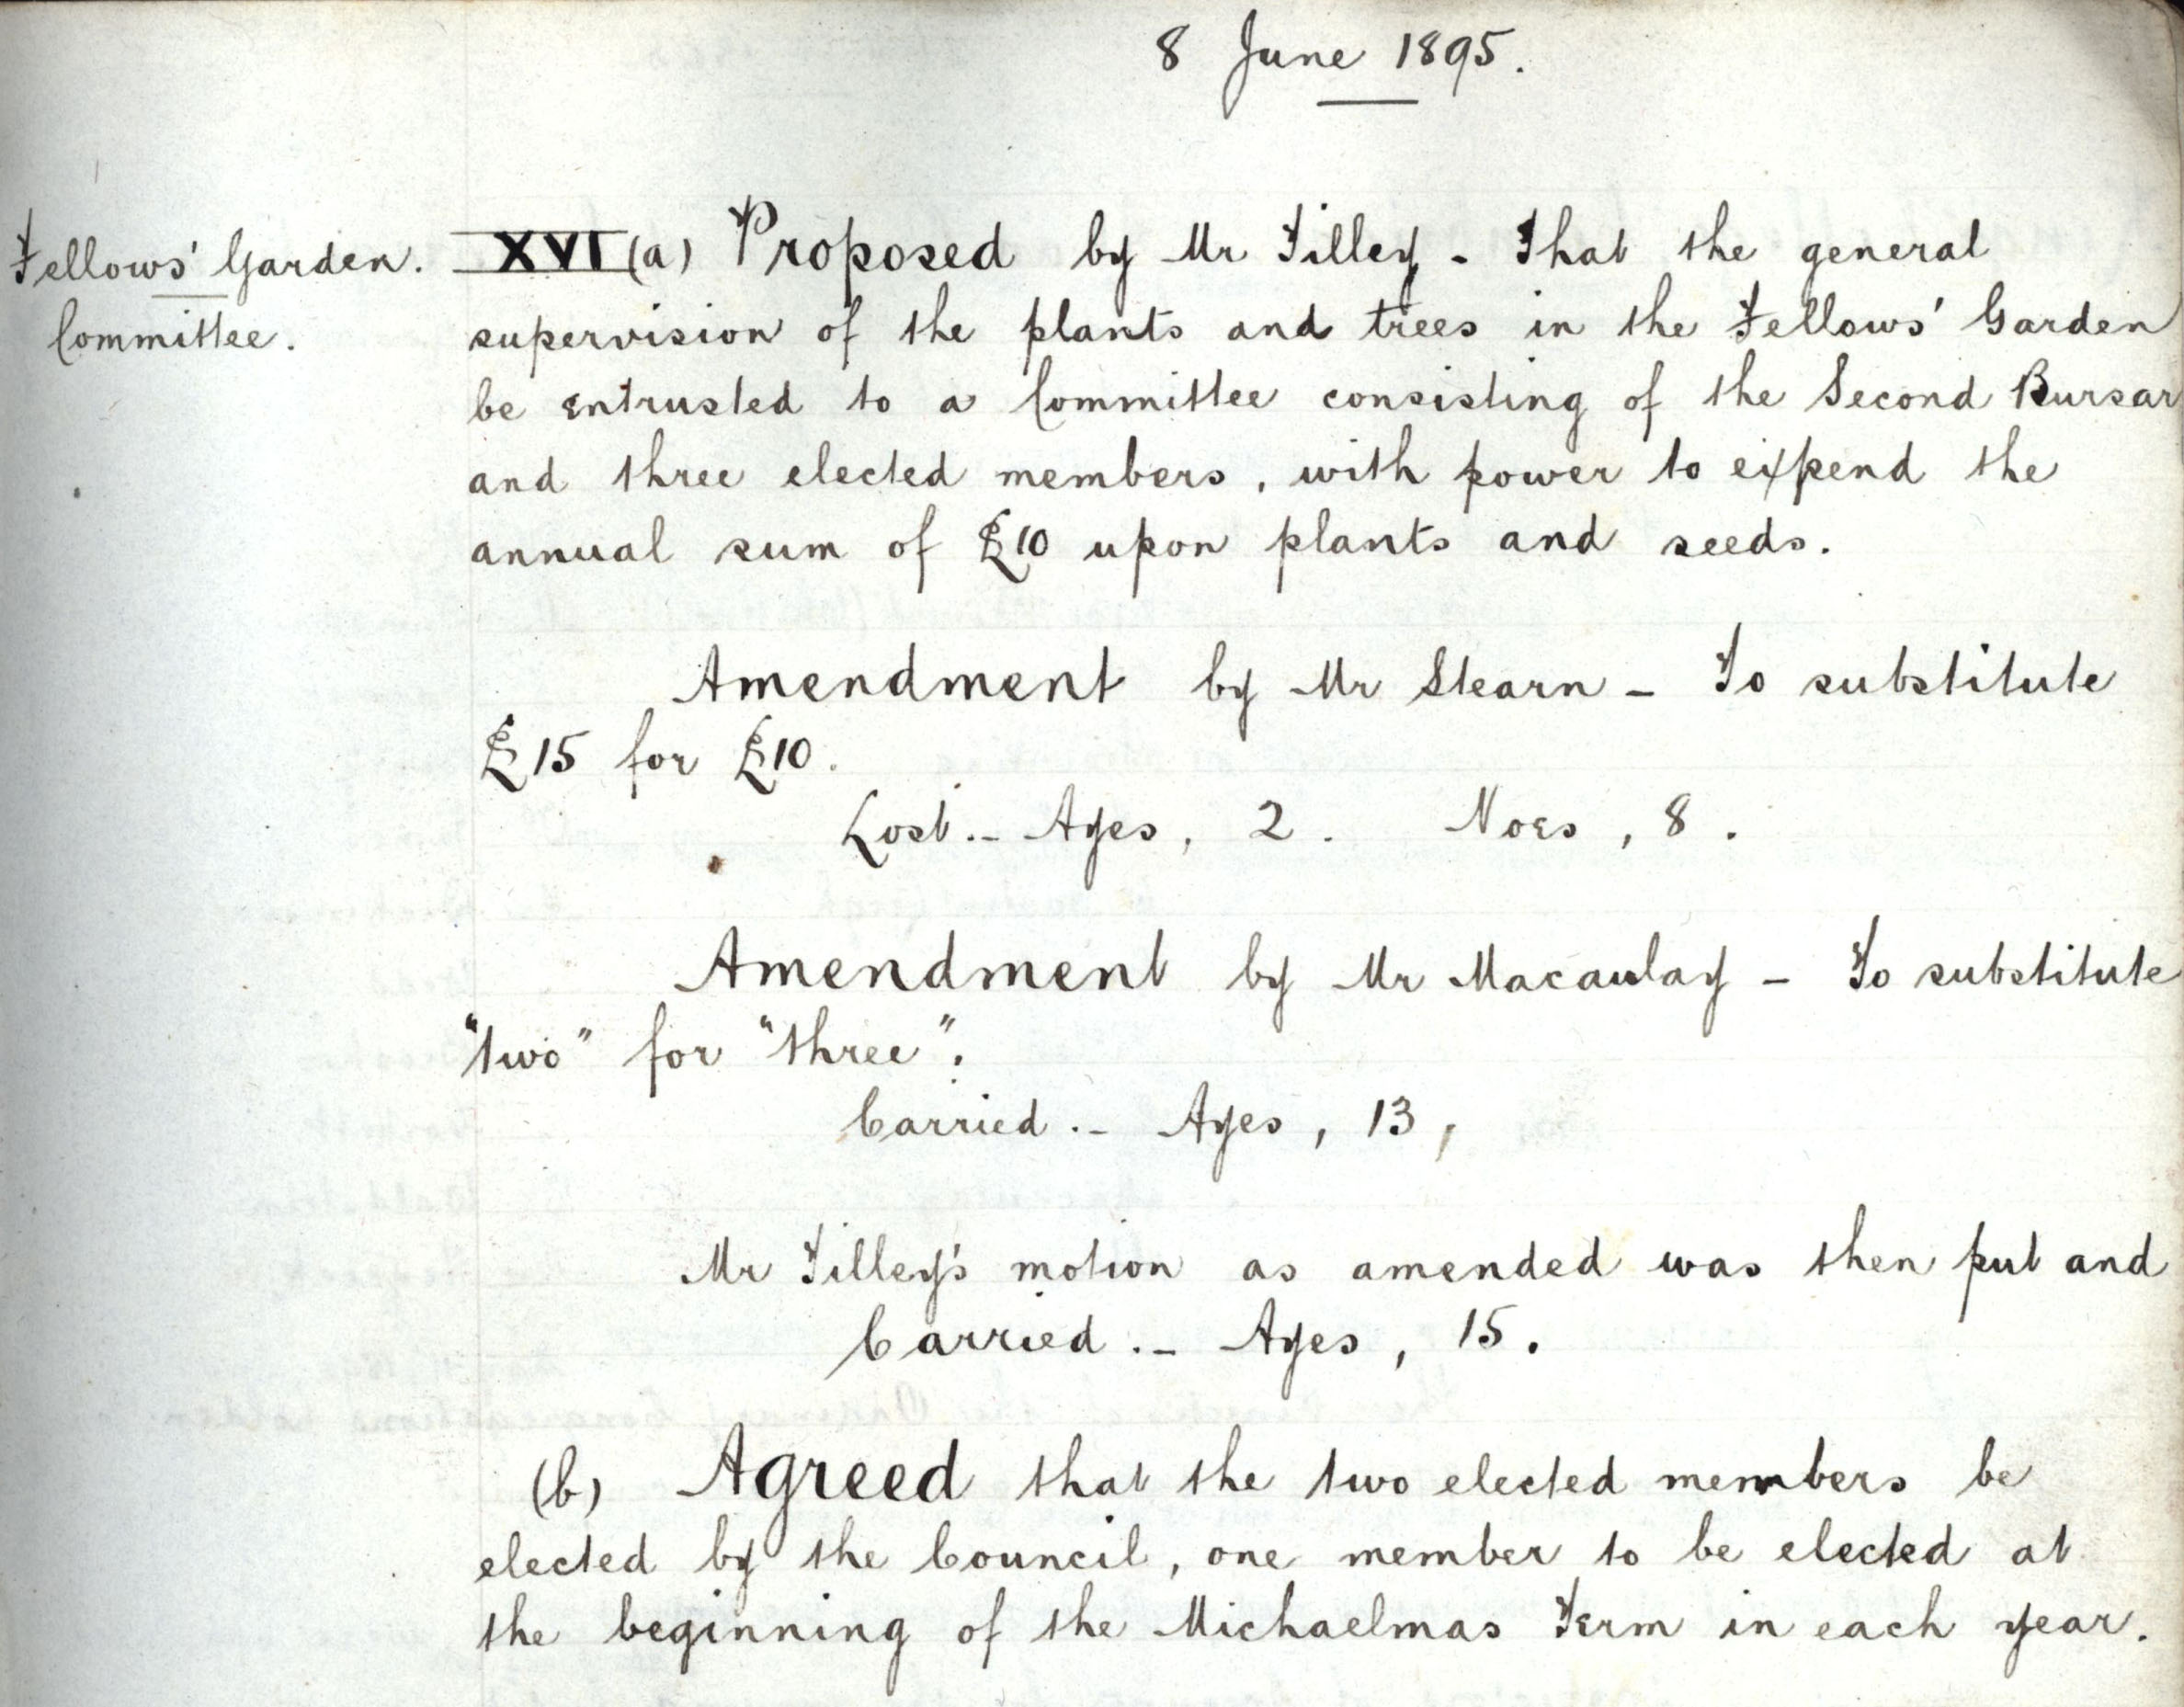 Congregation minutes, 8 June 1895